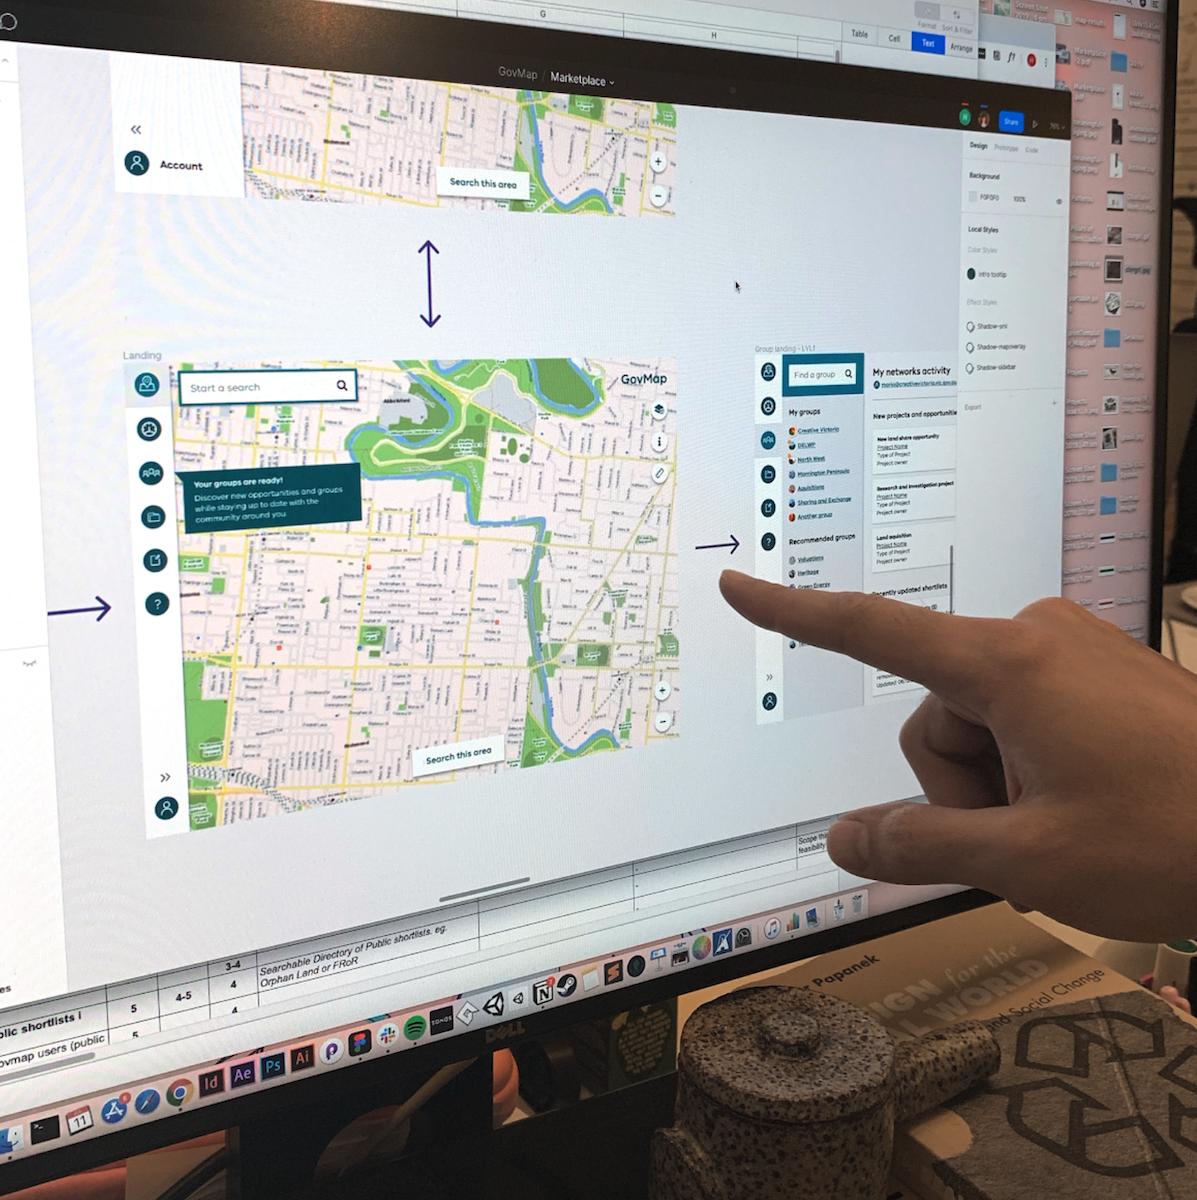 A desktop screen showing ideas for govmap's design